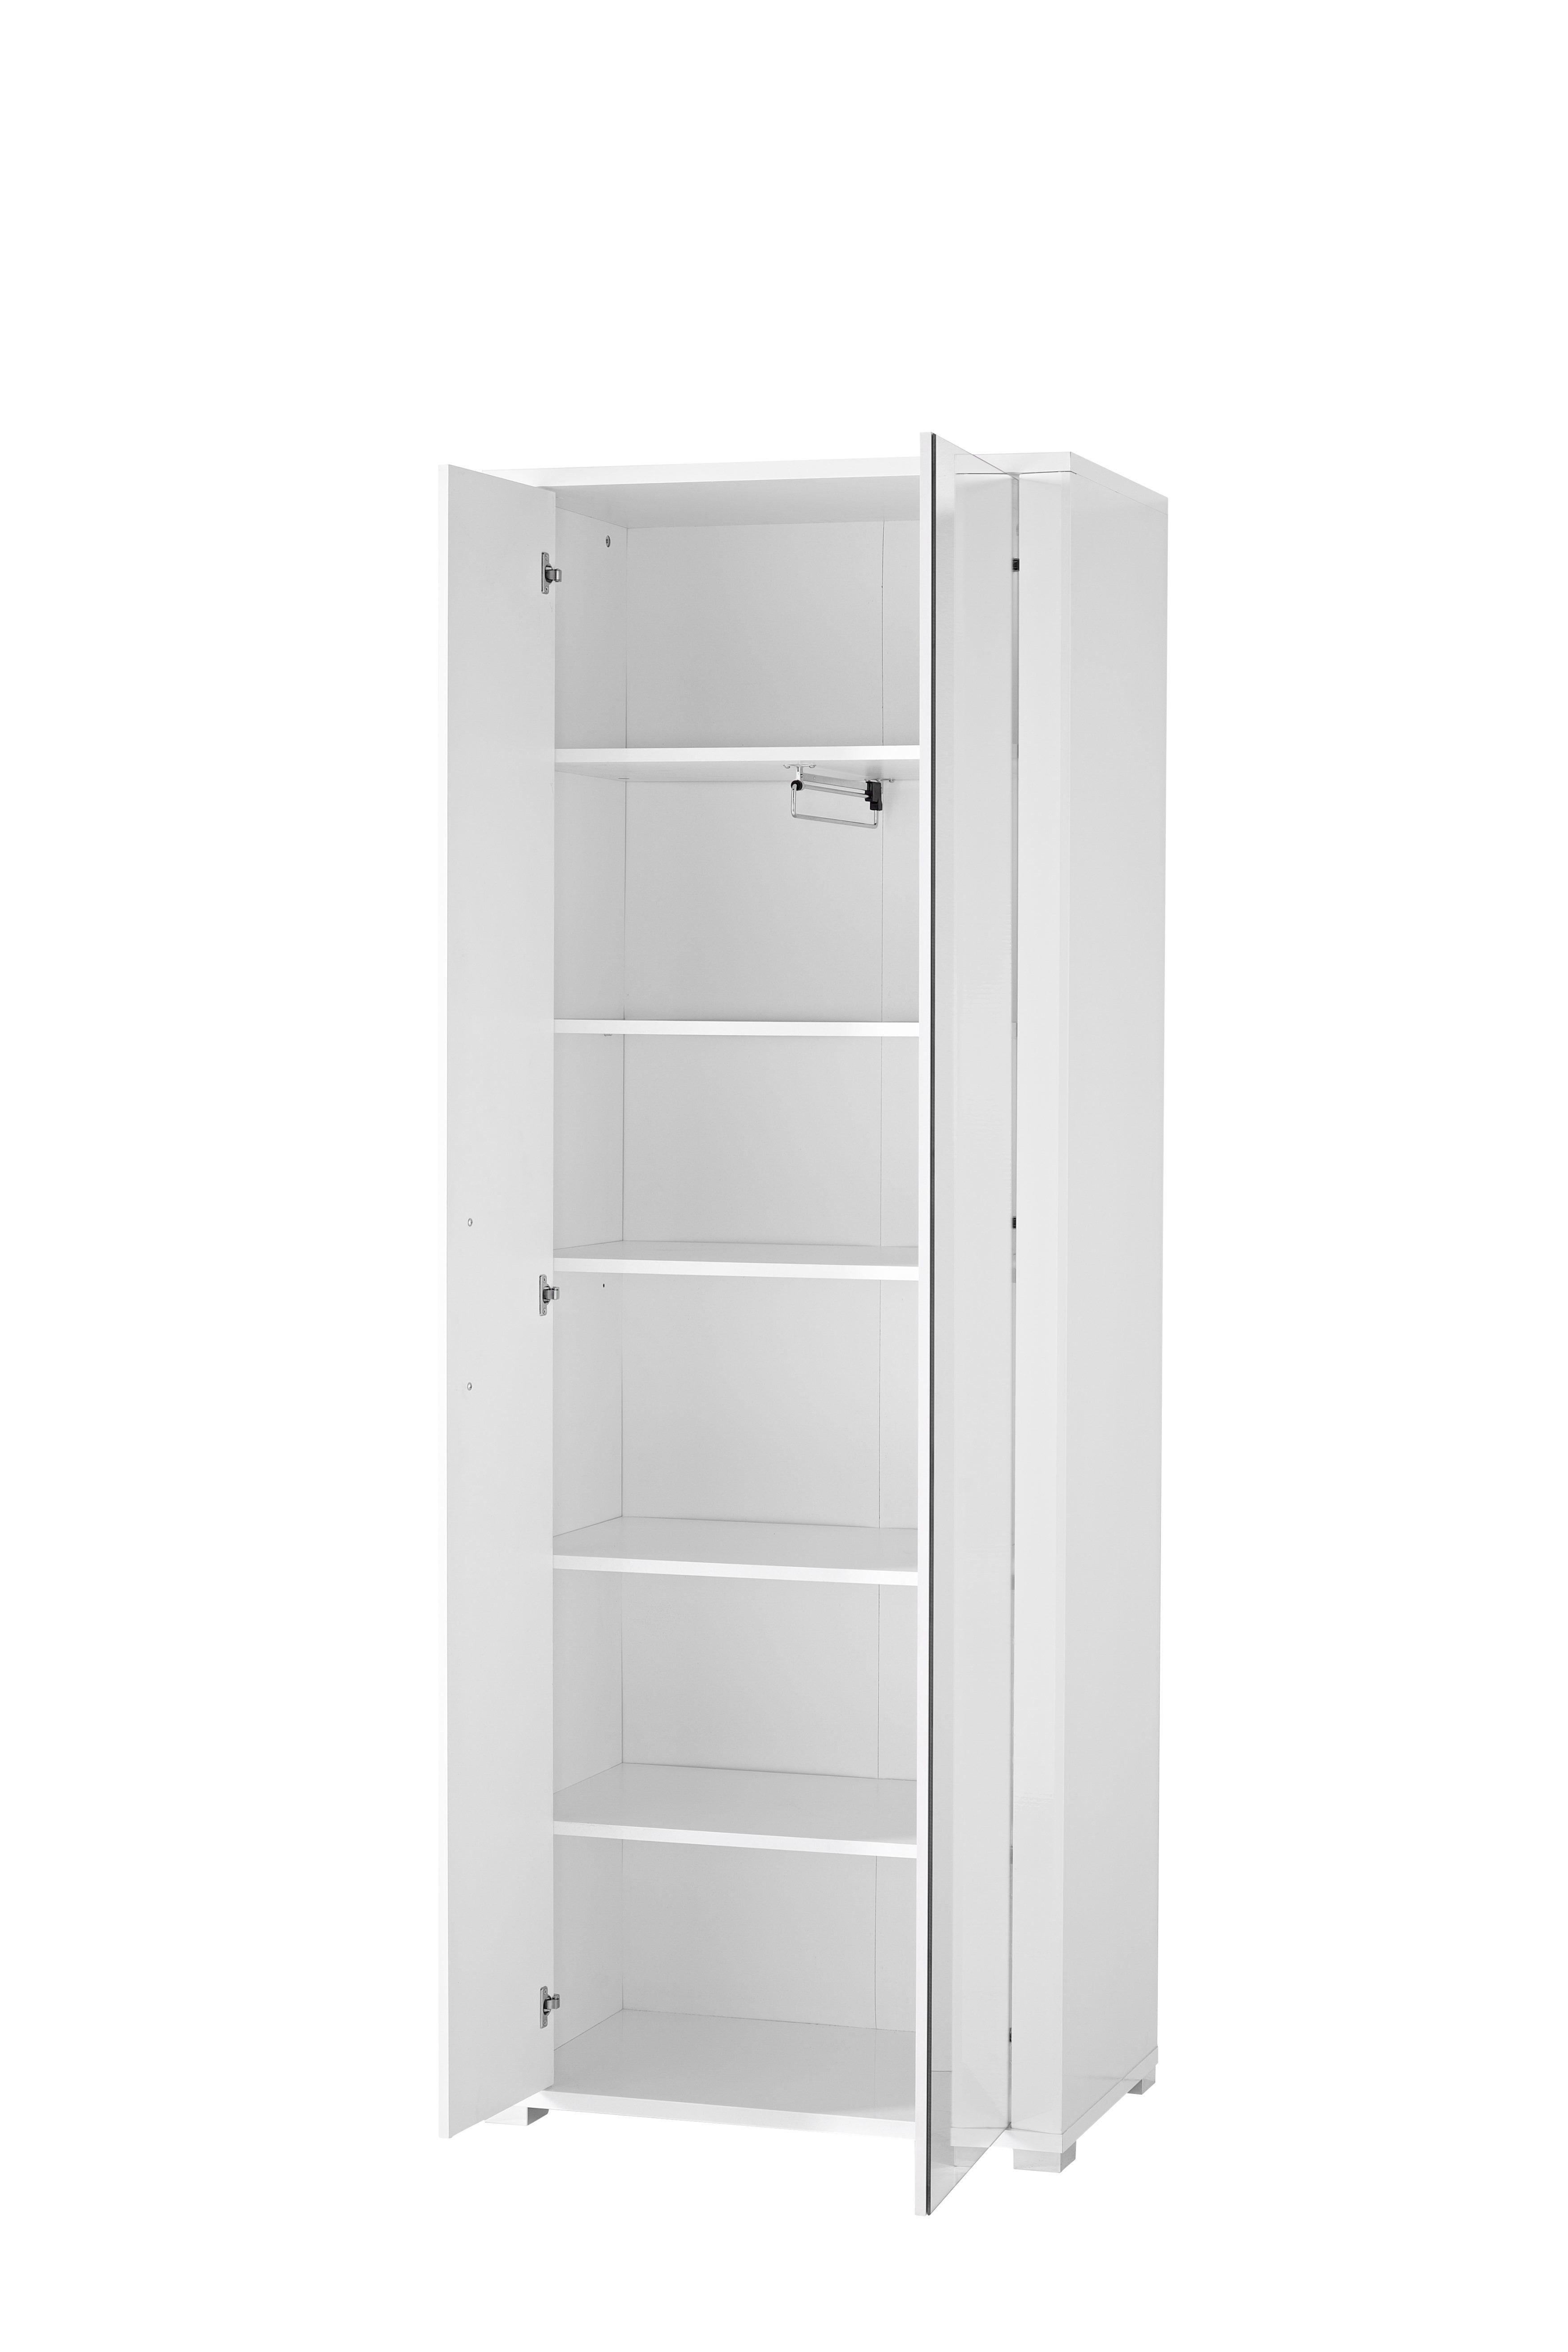 garderobe go 5 tlg garderobenschrank paneel bank schuhschrank spiegel wei ebay. Black Bedroom Furniture Sets. Home Design Ideas